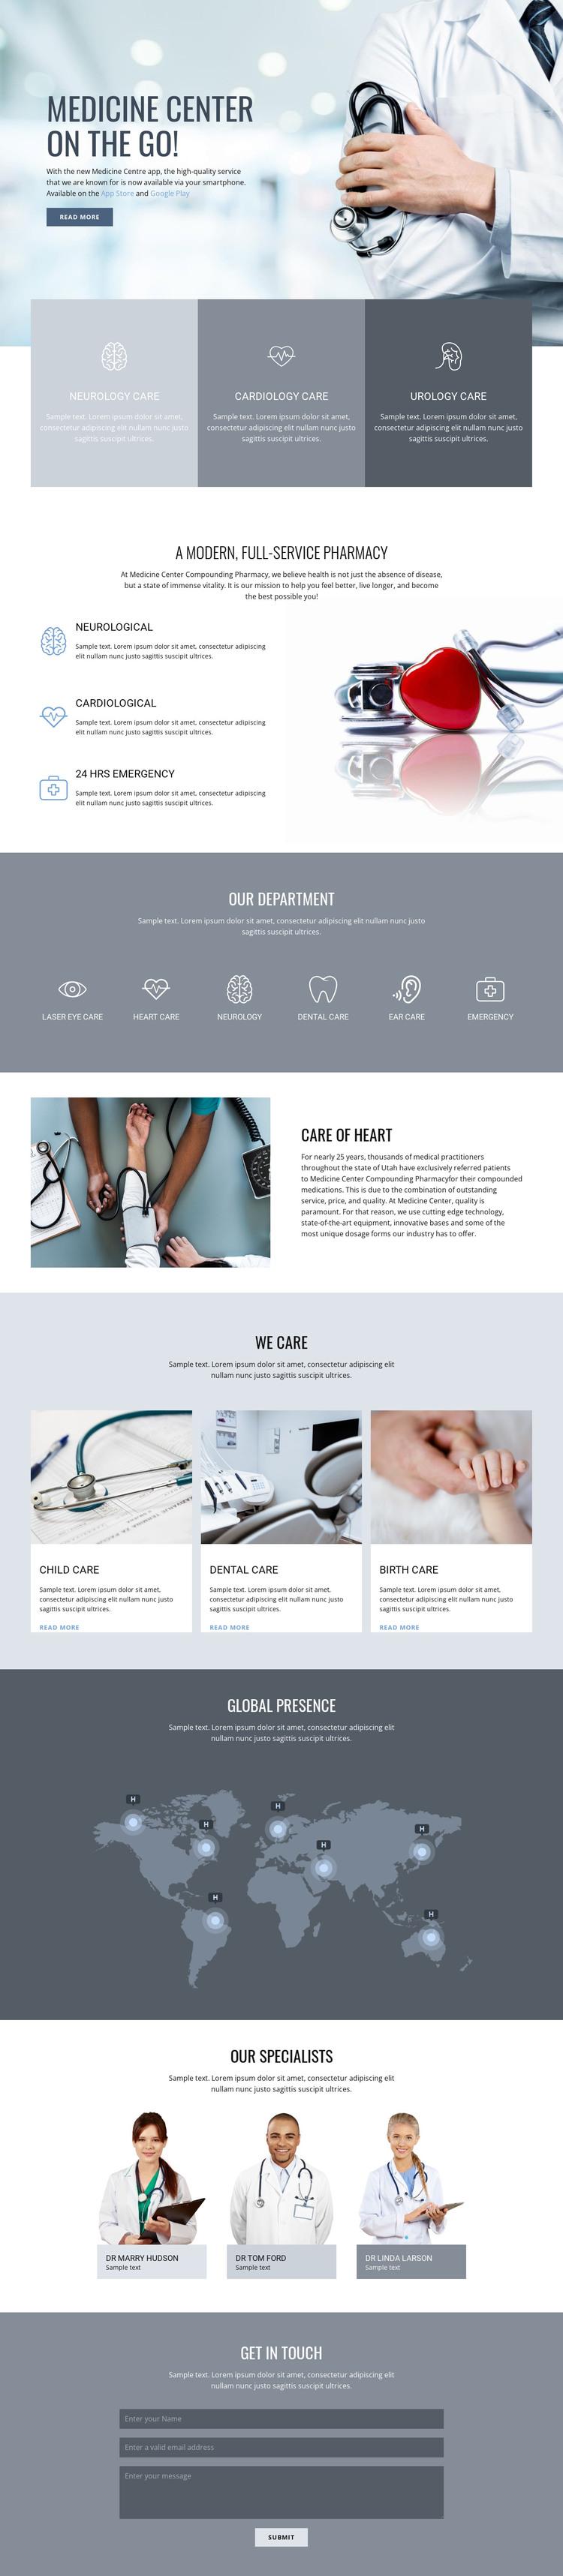 Pharmacy and medicine Web Design